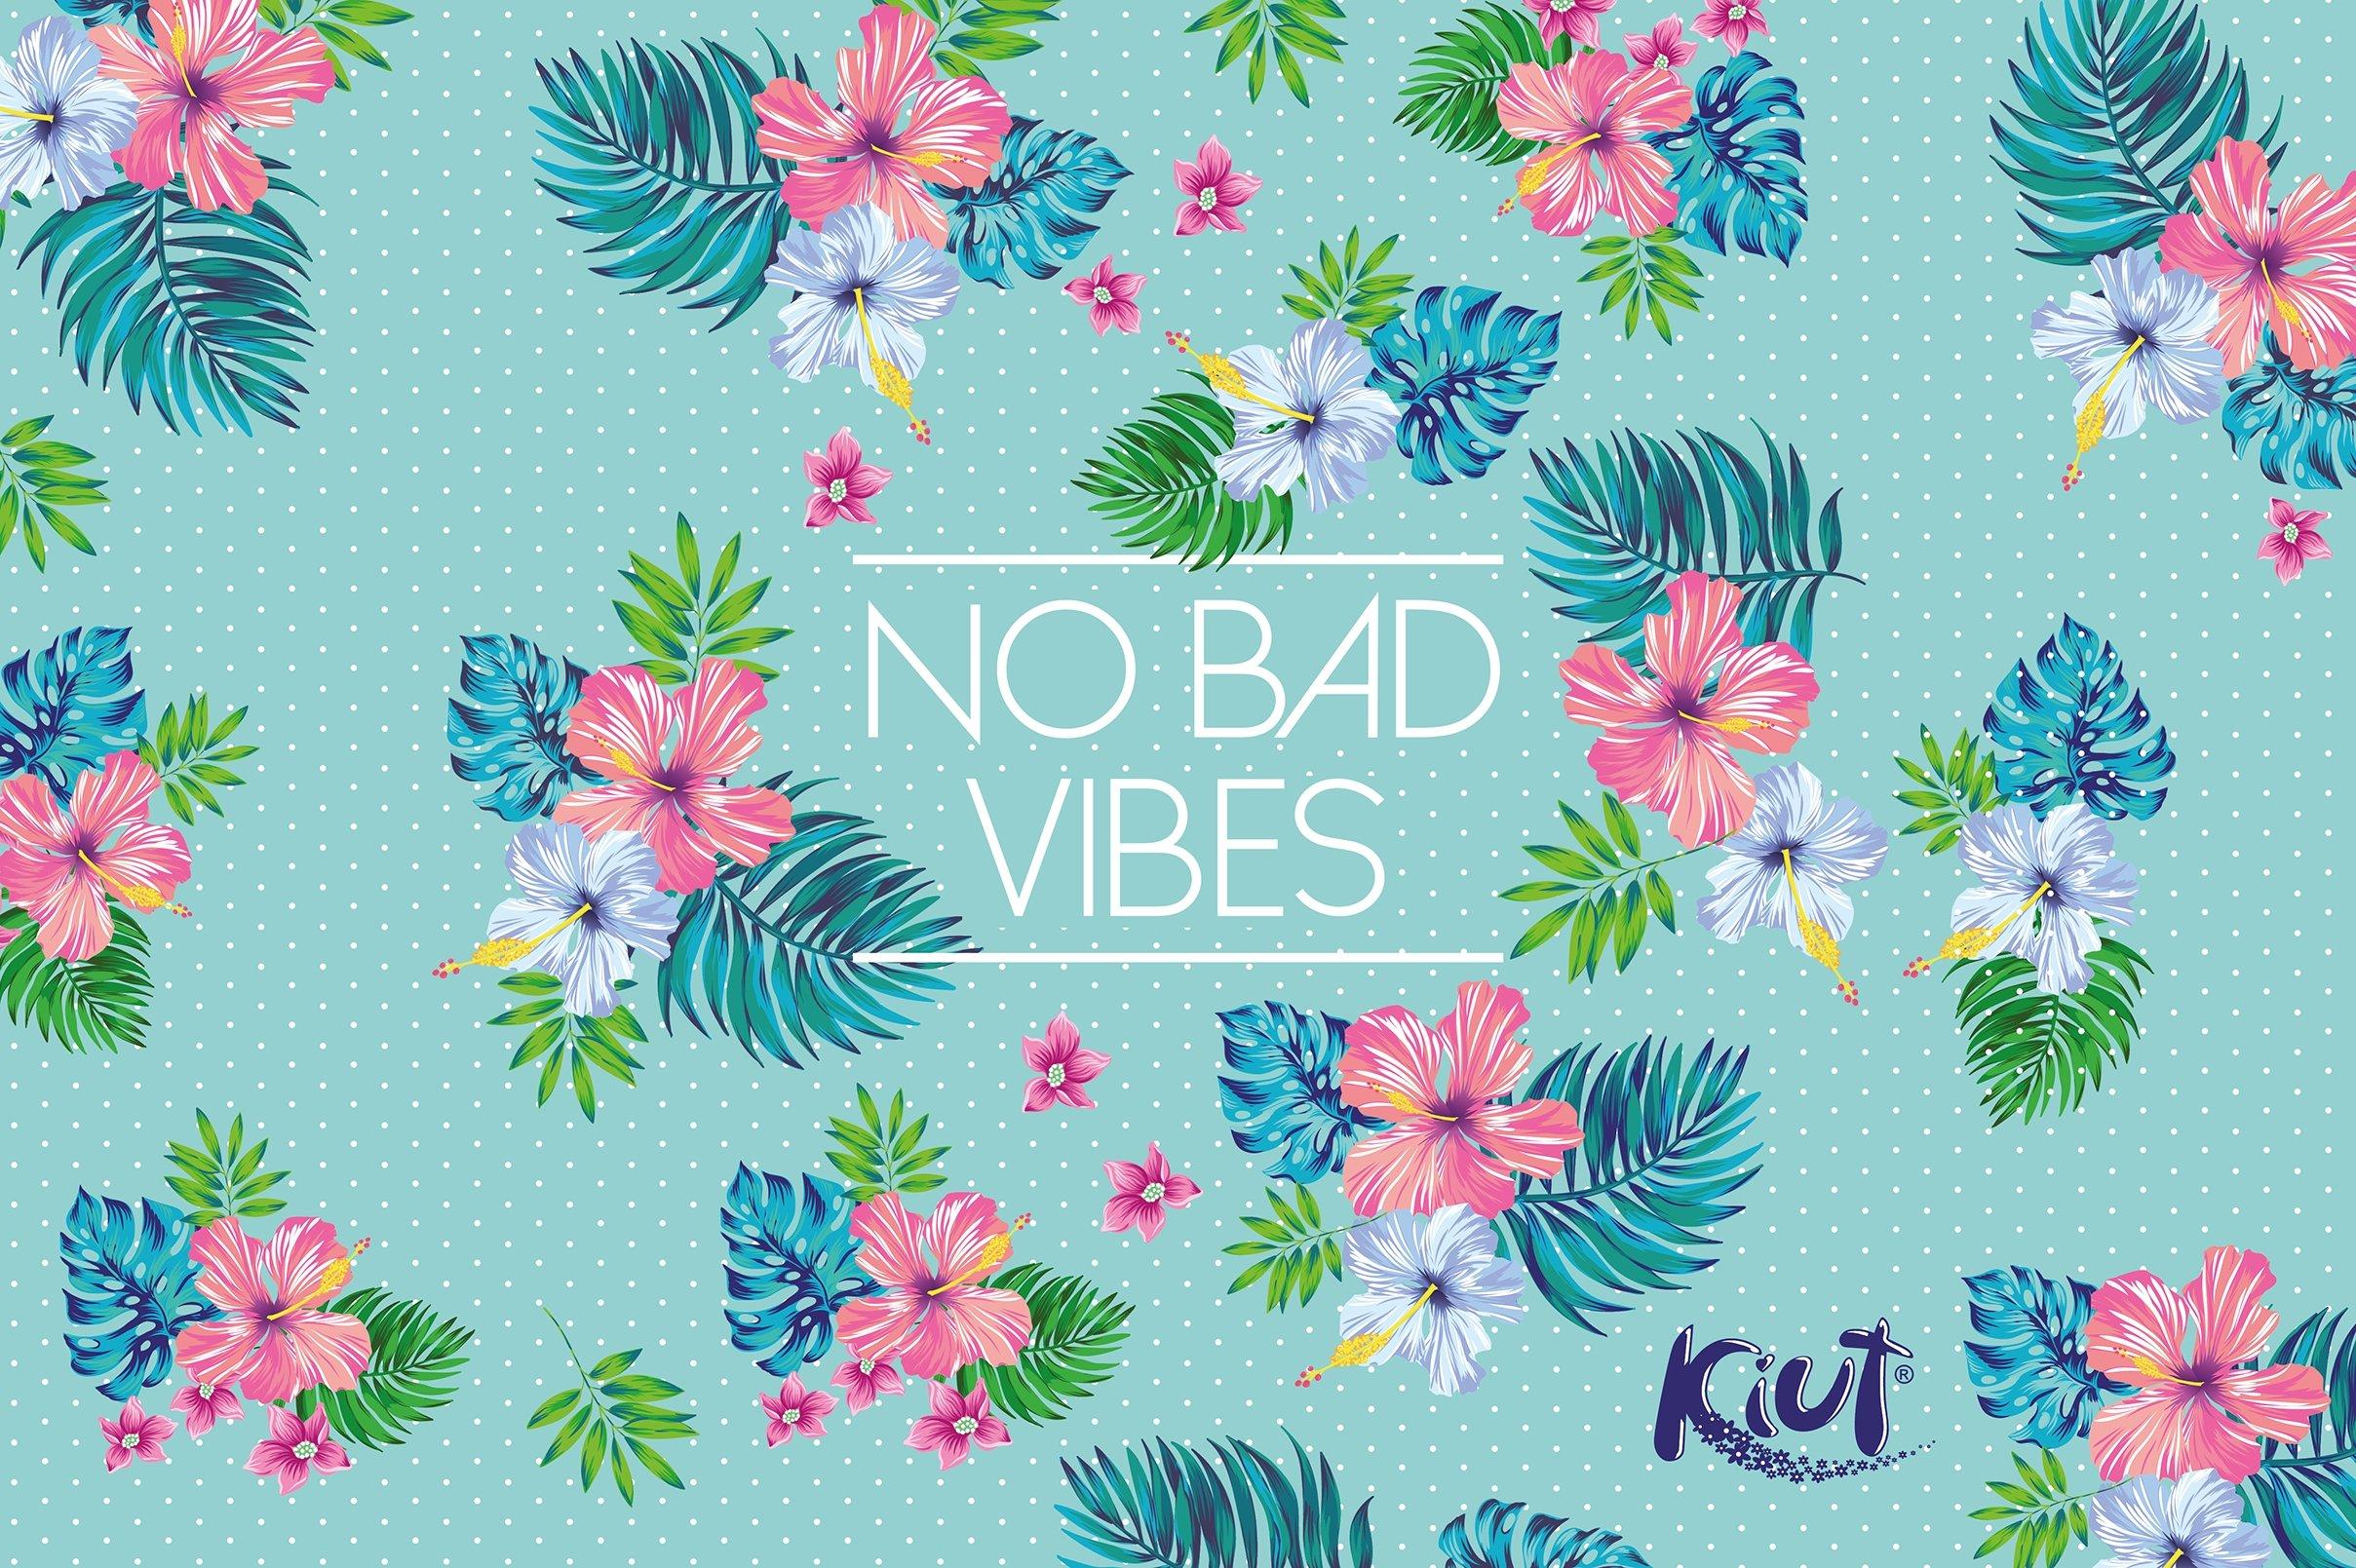 Wallpaper Kiut Flowers, No bad vibes